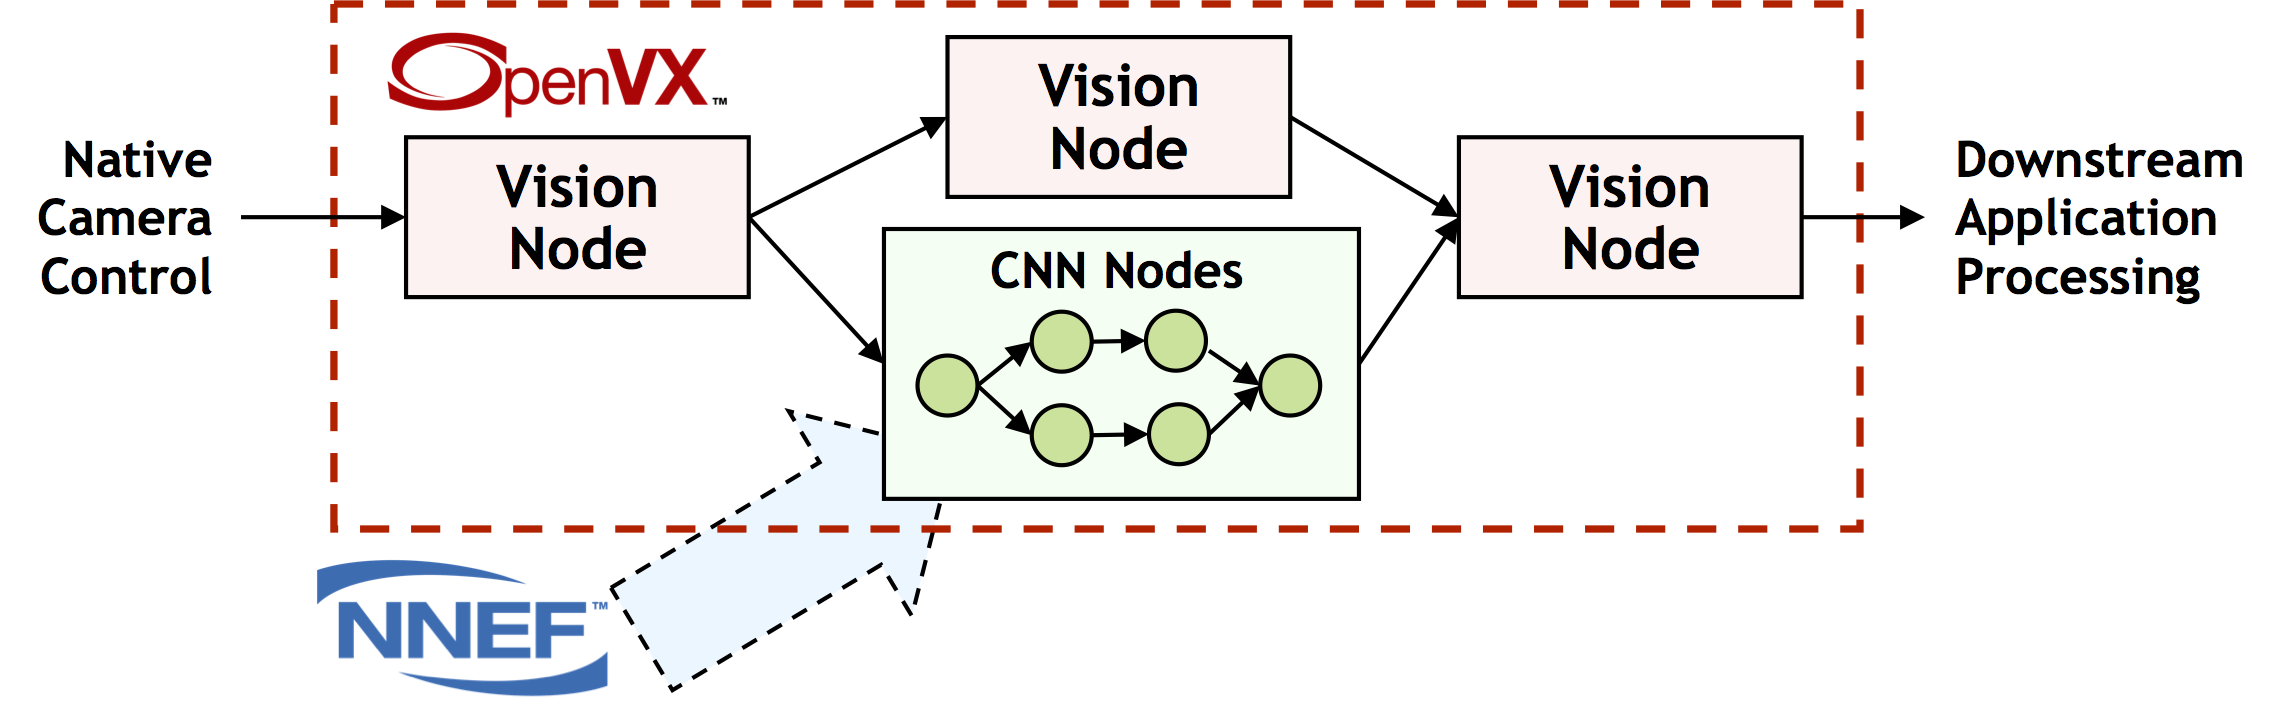 OpenVX Enhancements, Optimization Opportunities Expand